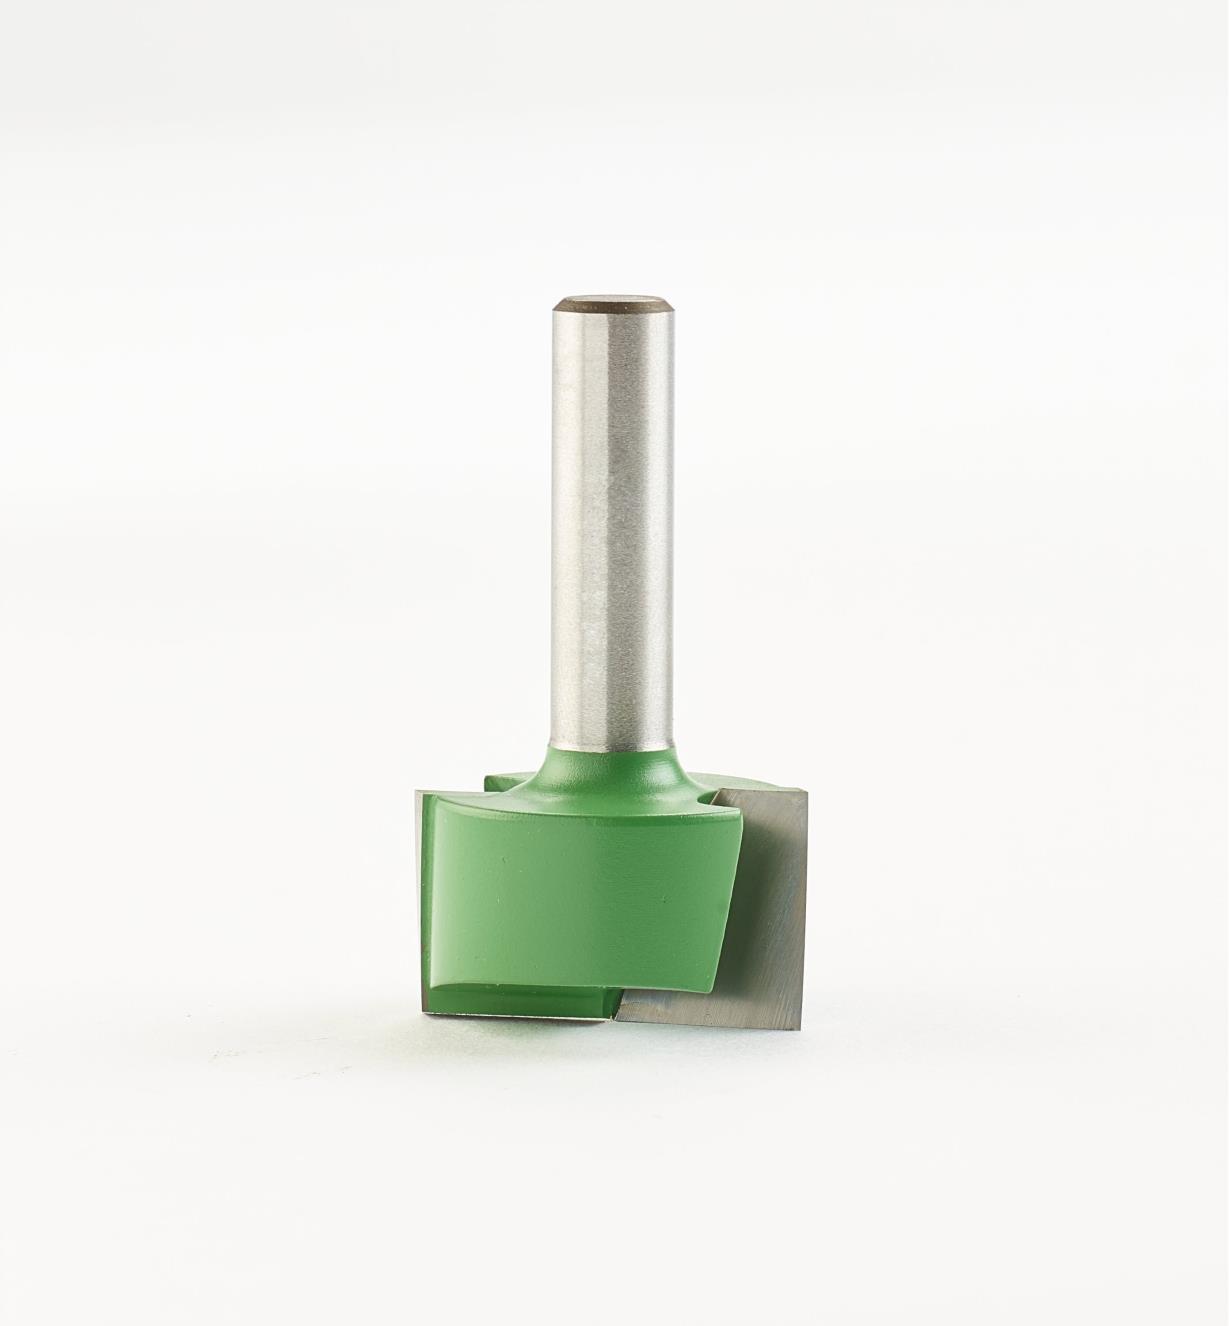 "18J2516 - 1"" Flattening Bit, 8mm Shank"